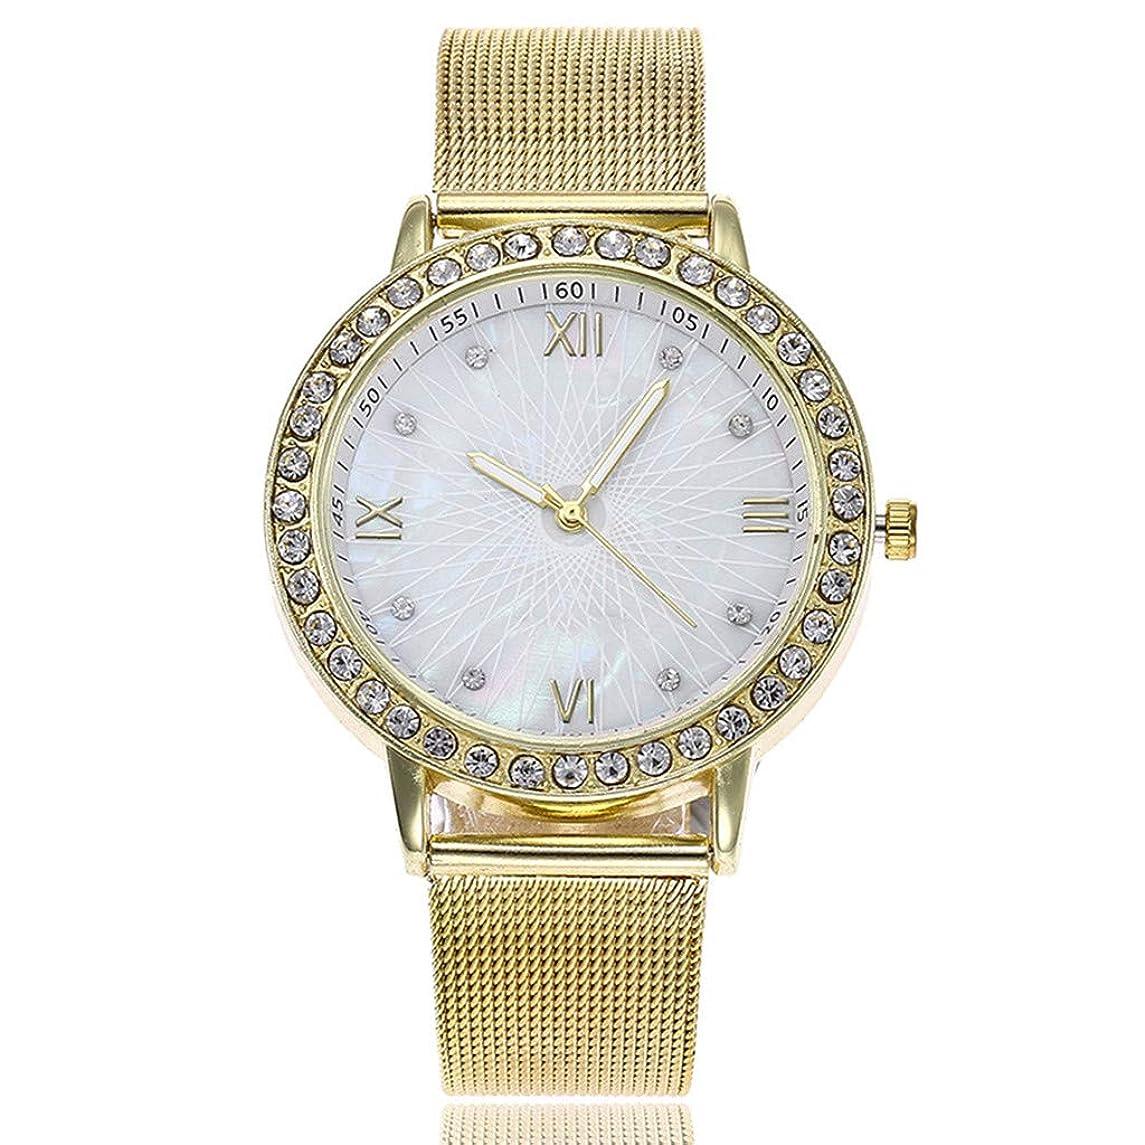 Mens Watches Clearance, Fashion Women Casual Watch Luxury Analog Quartz Wristwatch(Gold)